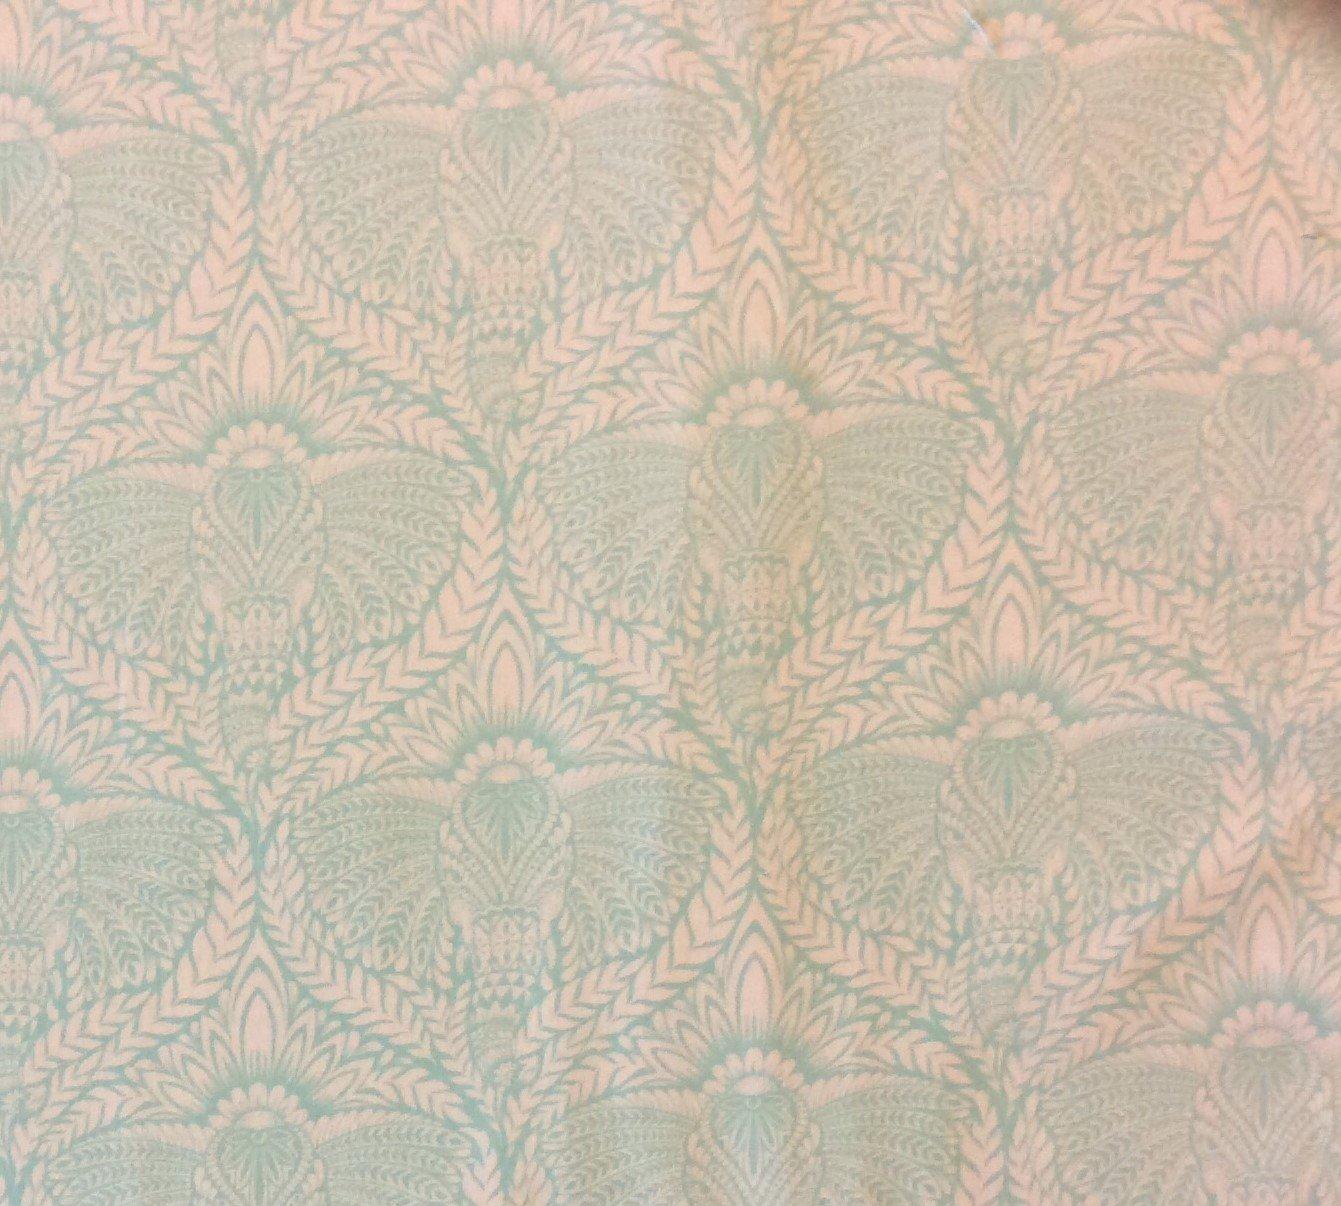 TULA PINK India Damask Ganesh Lotus Good Luck Quilting Cotton Fabric WE103